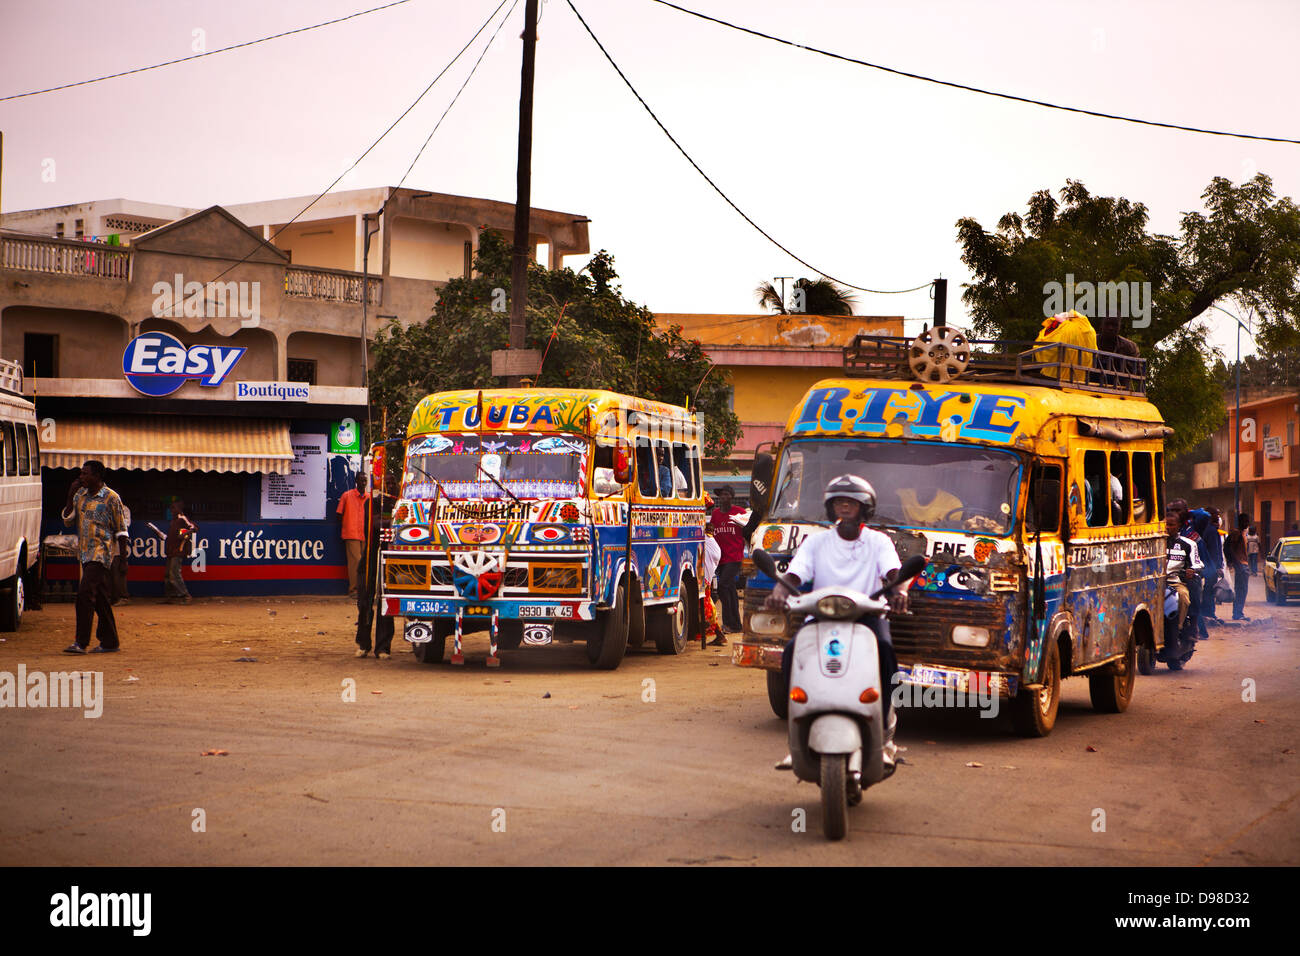 Los autobuses, Pikin barrio, Dakar, Senegal Imagen De Stock